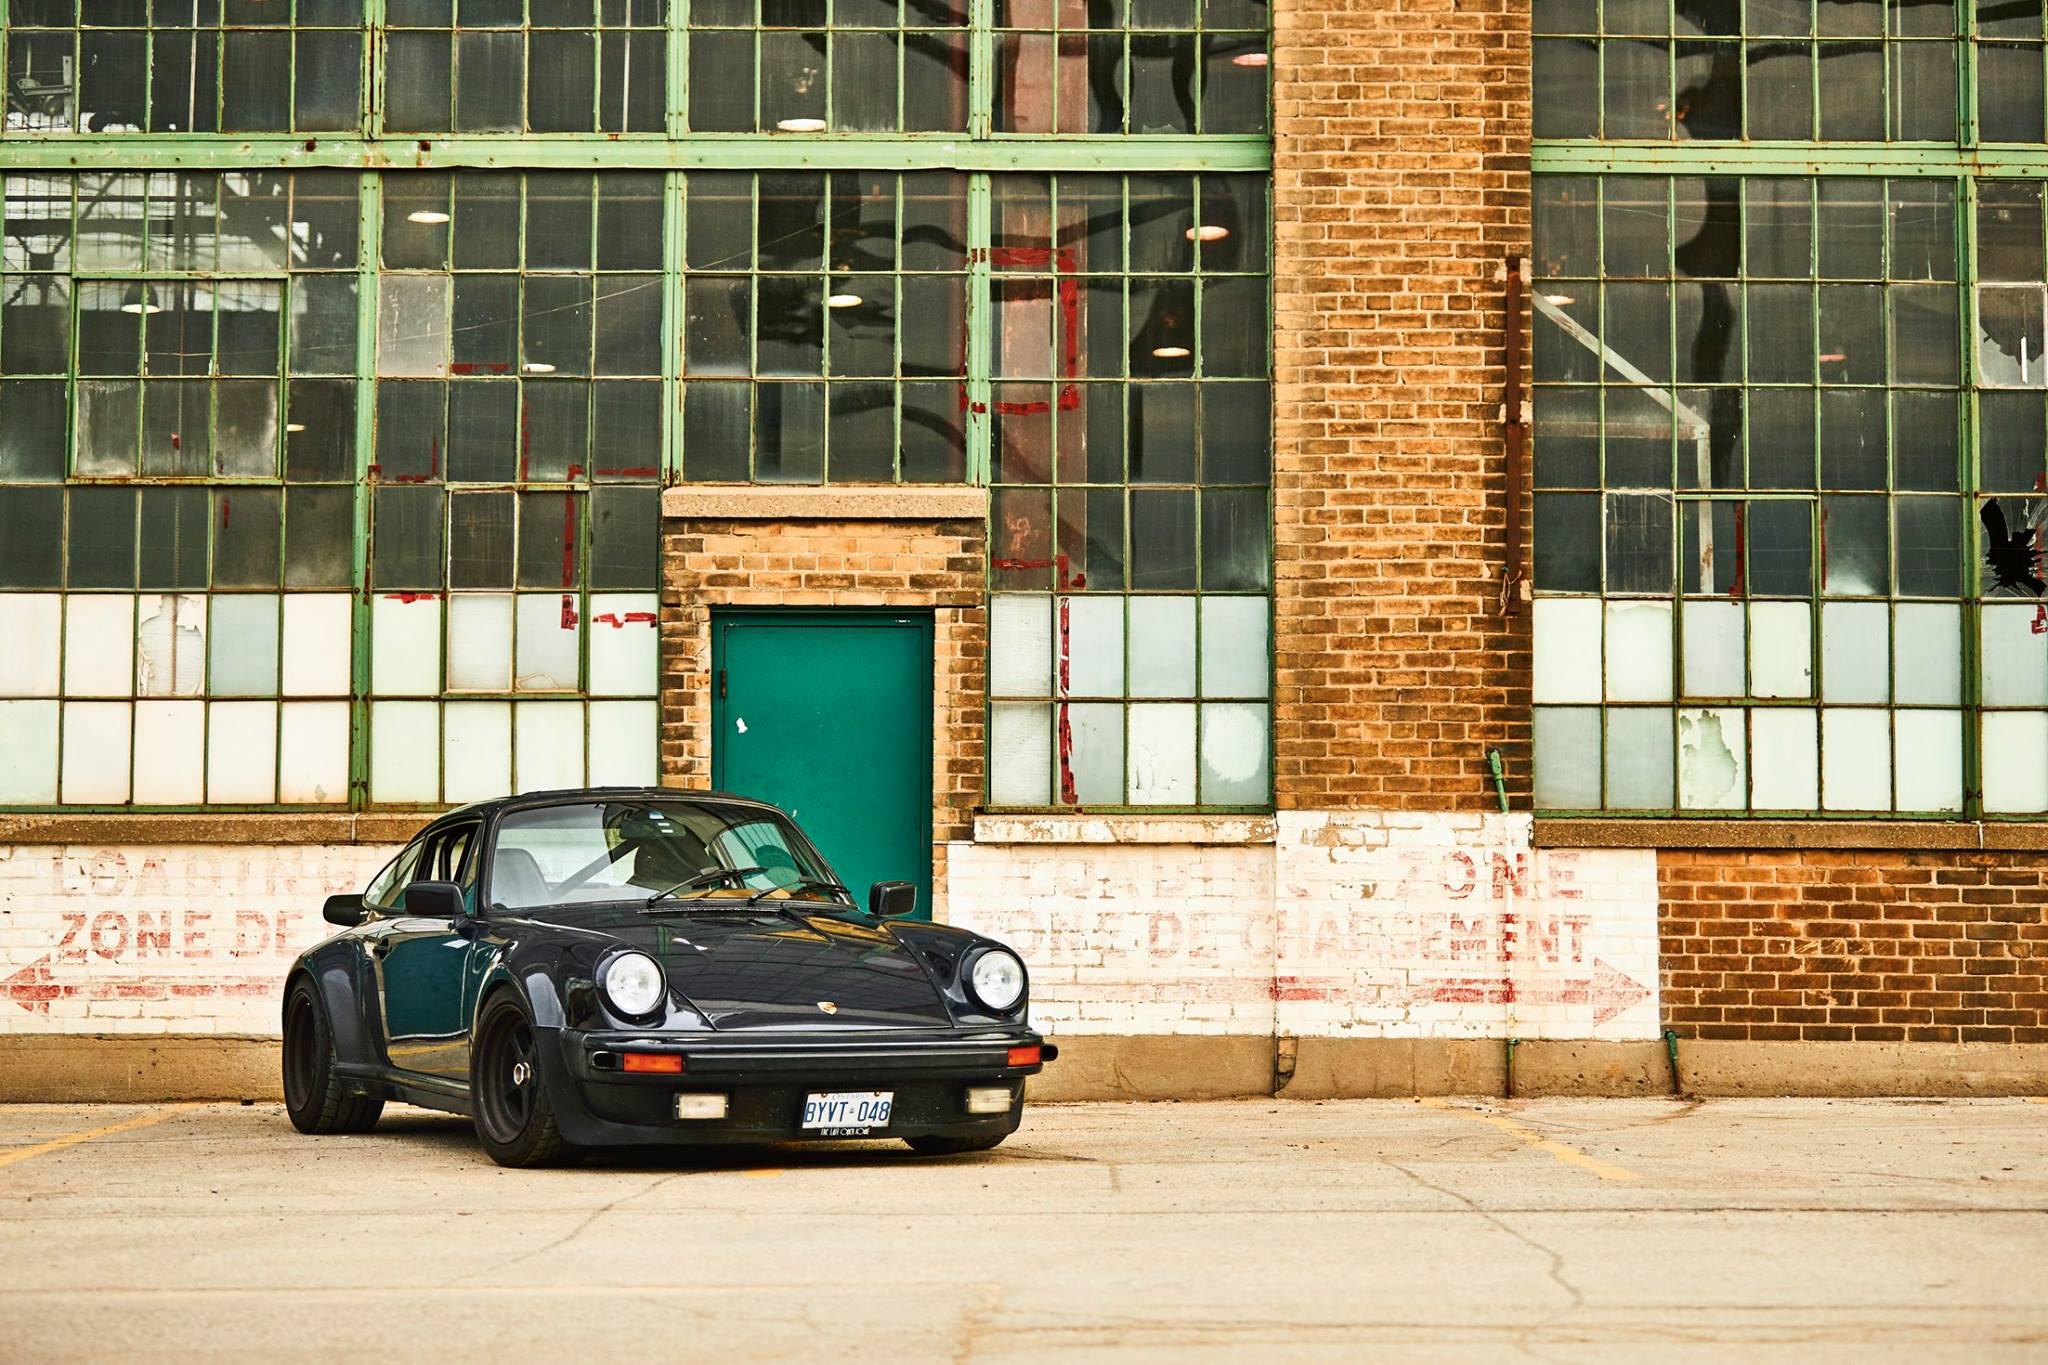 Bill MacEachern Porsche 911 Turbo (1)